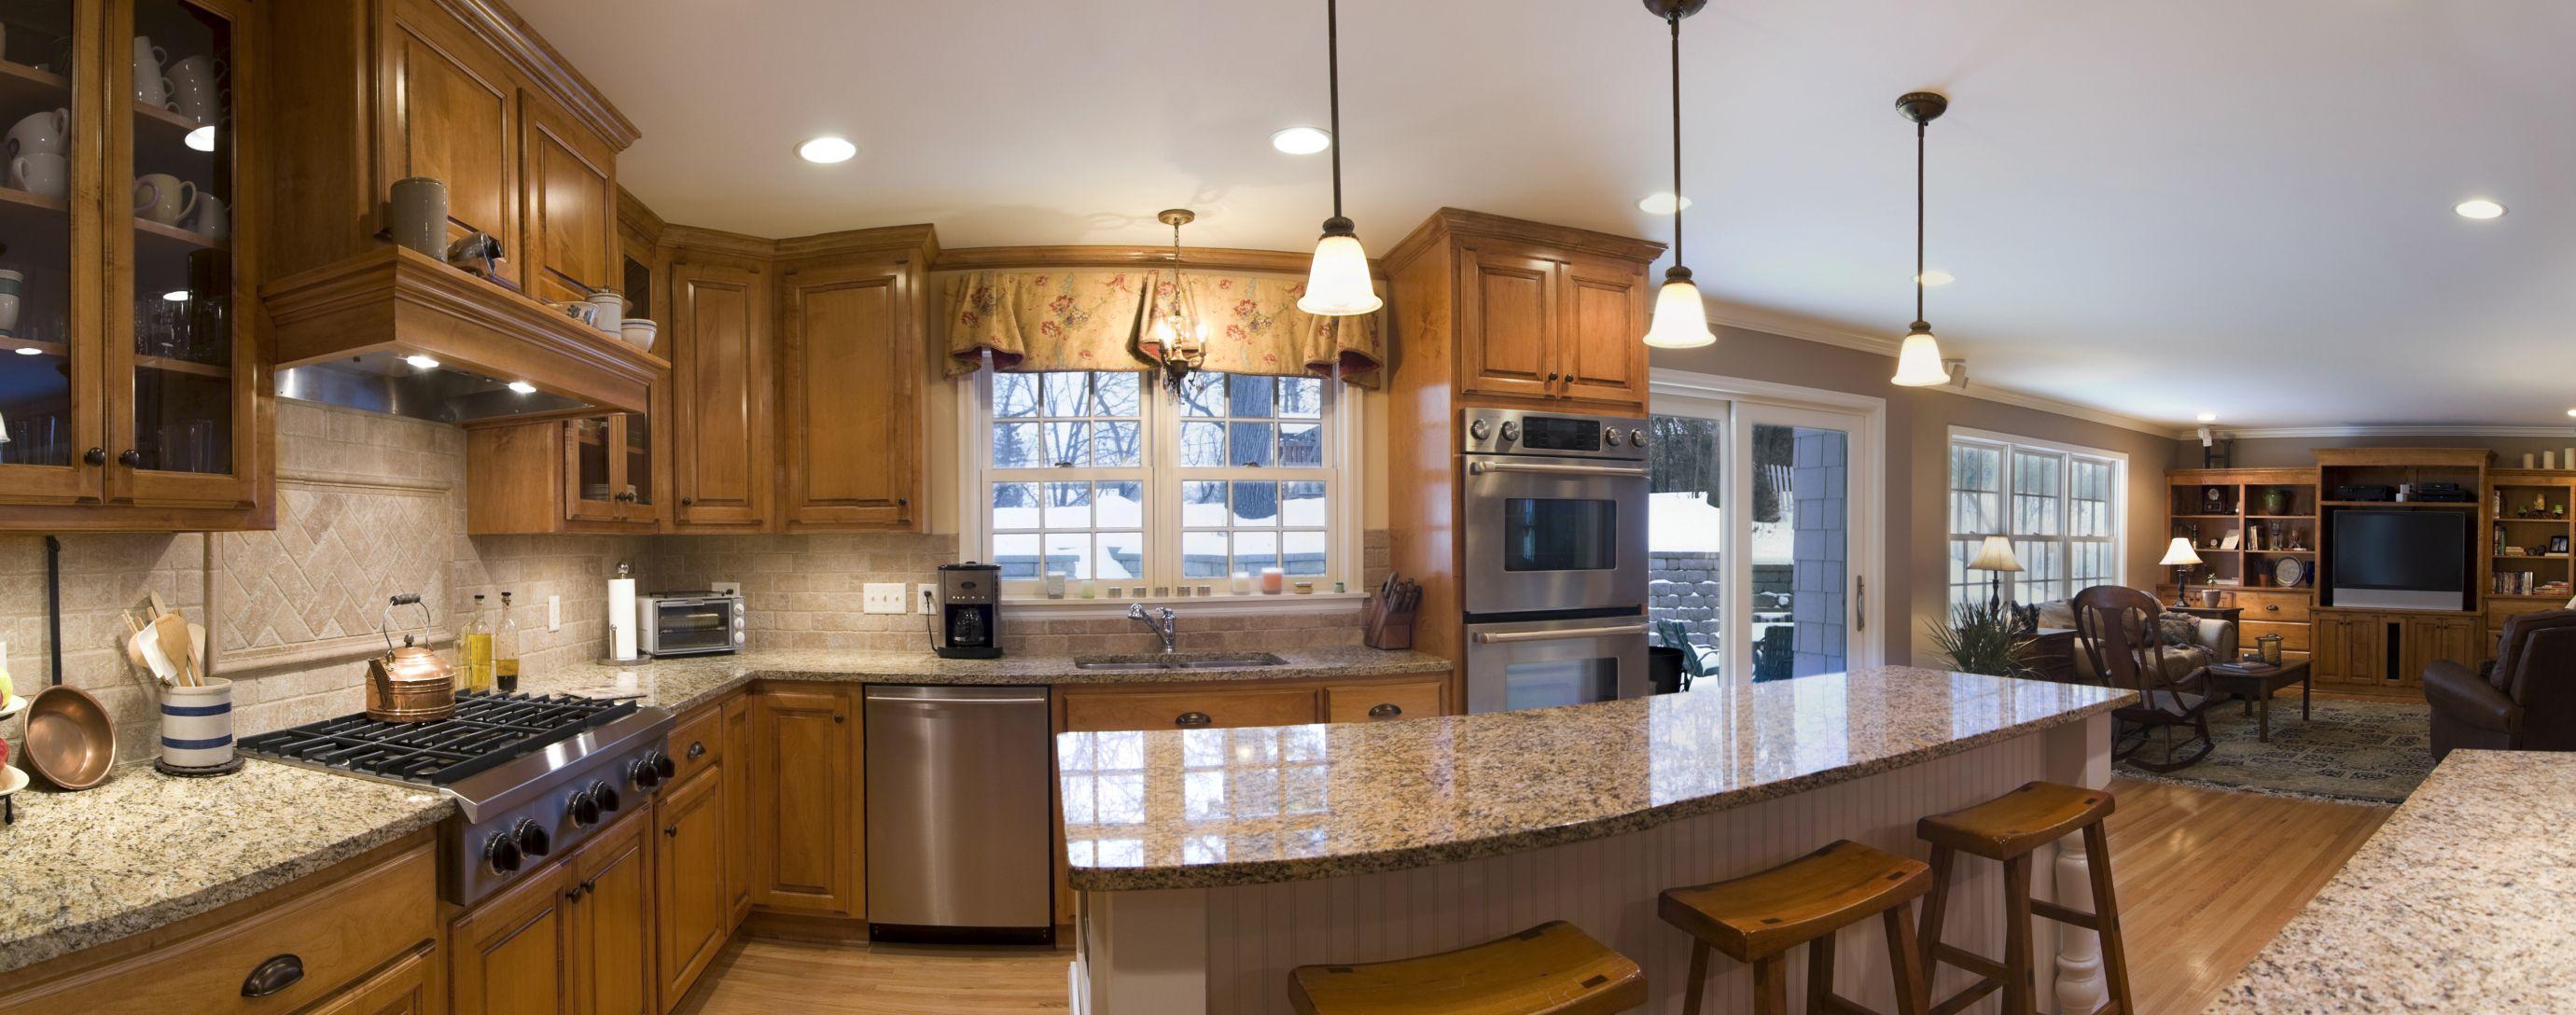 Affordable Kitchen Design Mr16 Led Exceptional Quality For Affordable Costs  Mr16 Led